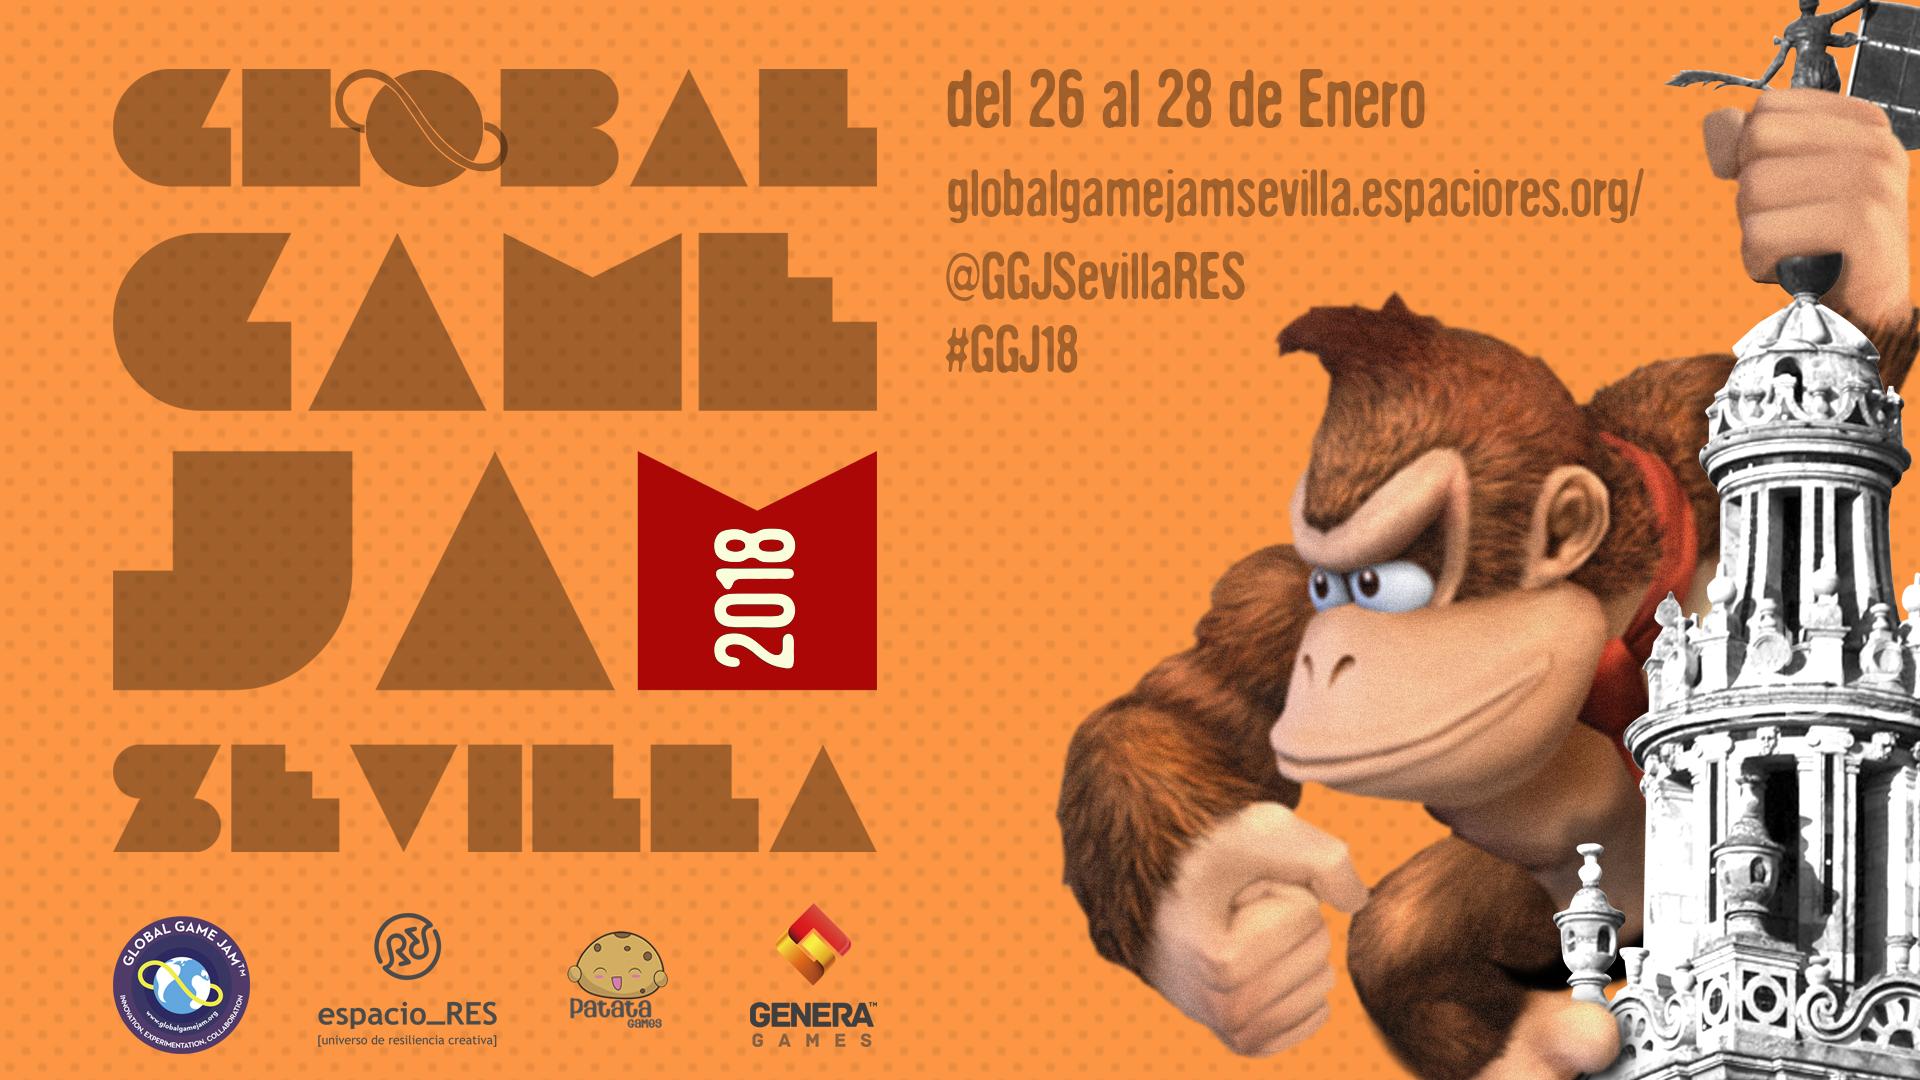 Cartel de la Global game jam sevilla 2018